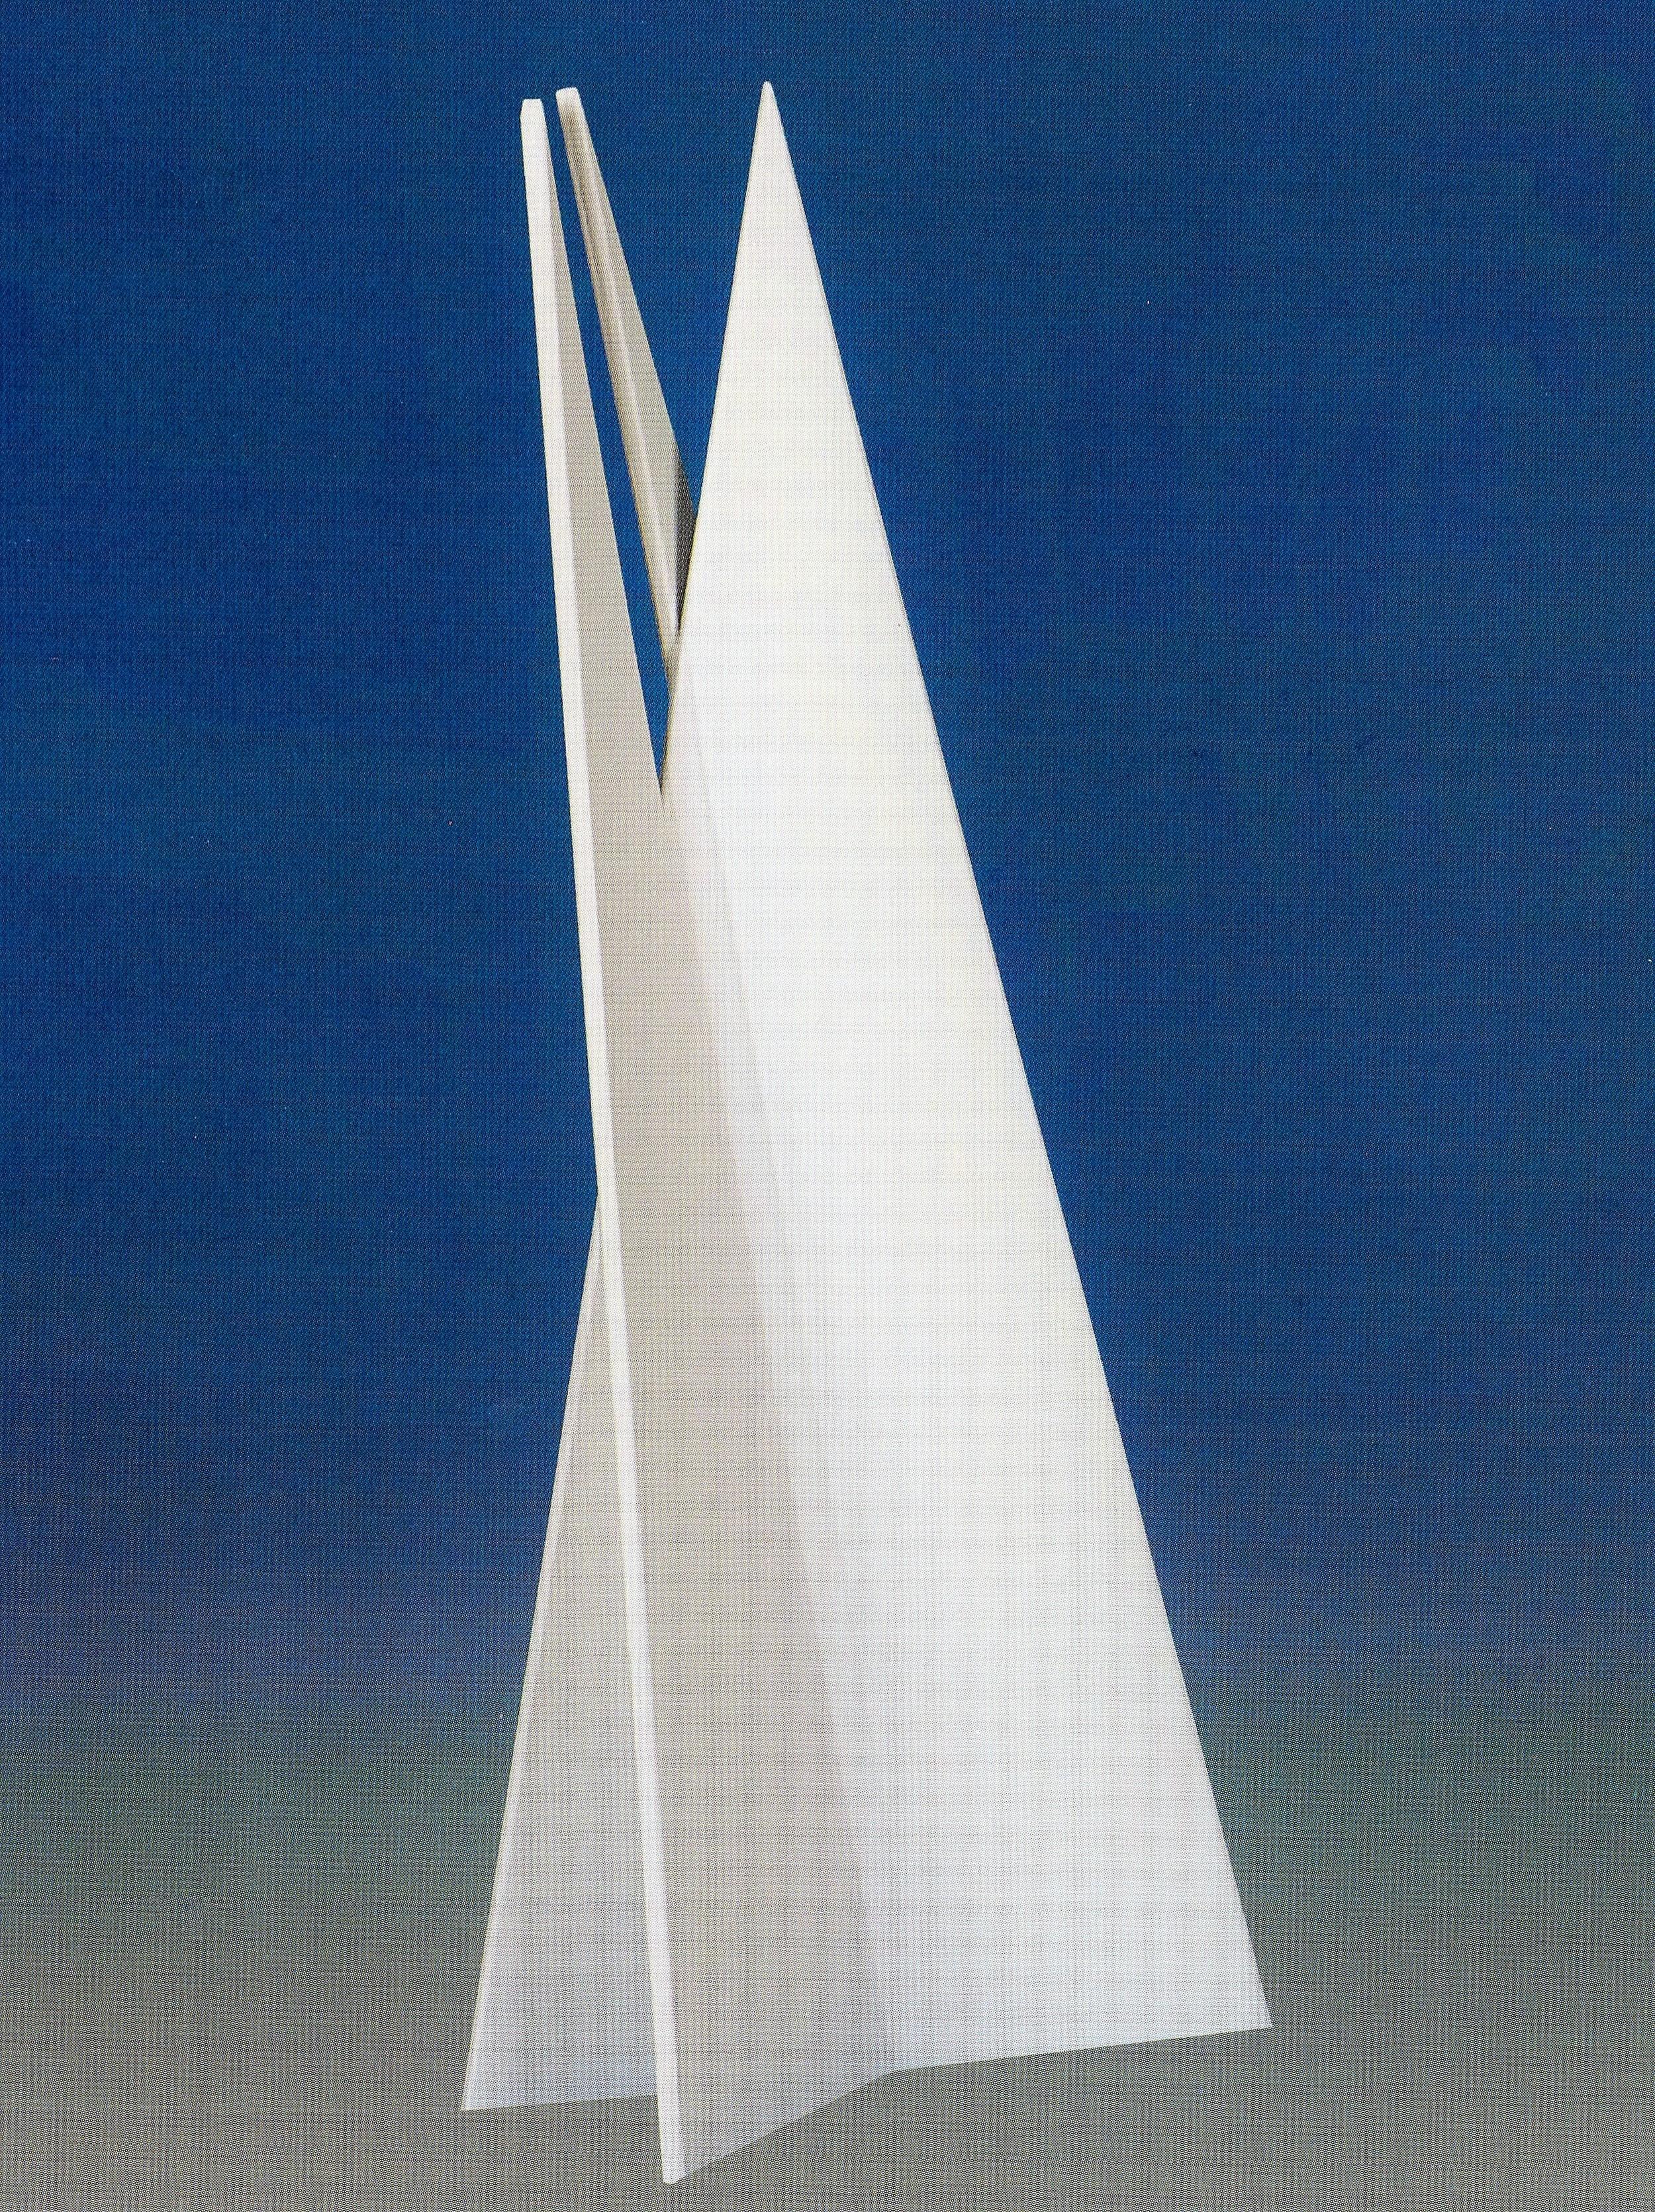 Velas de Mar (5)